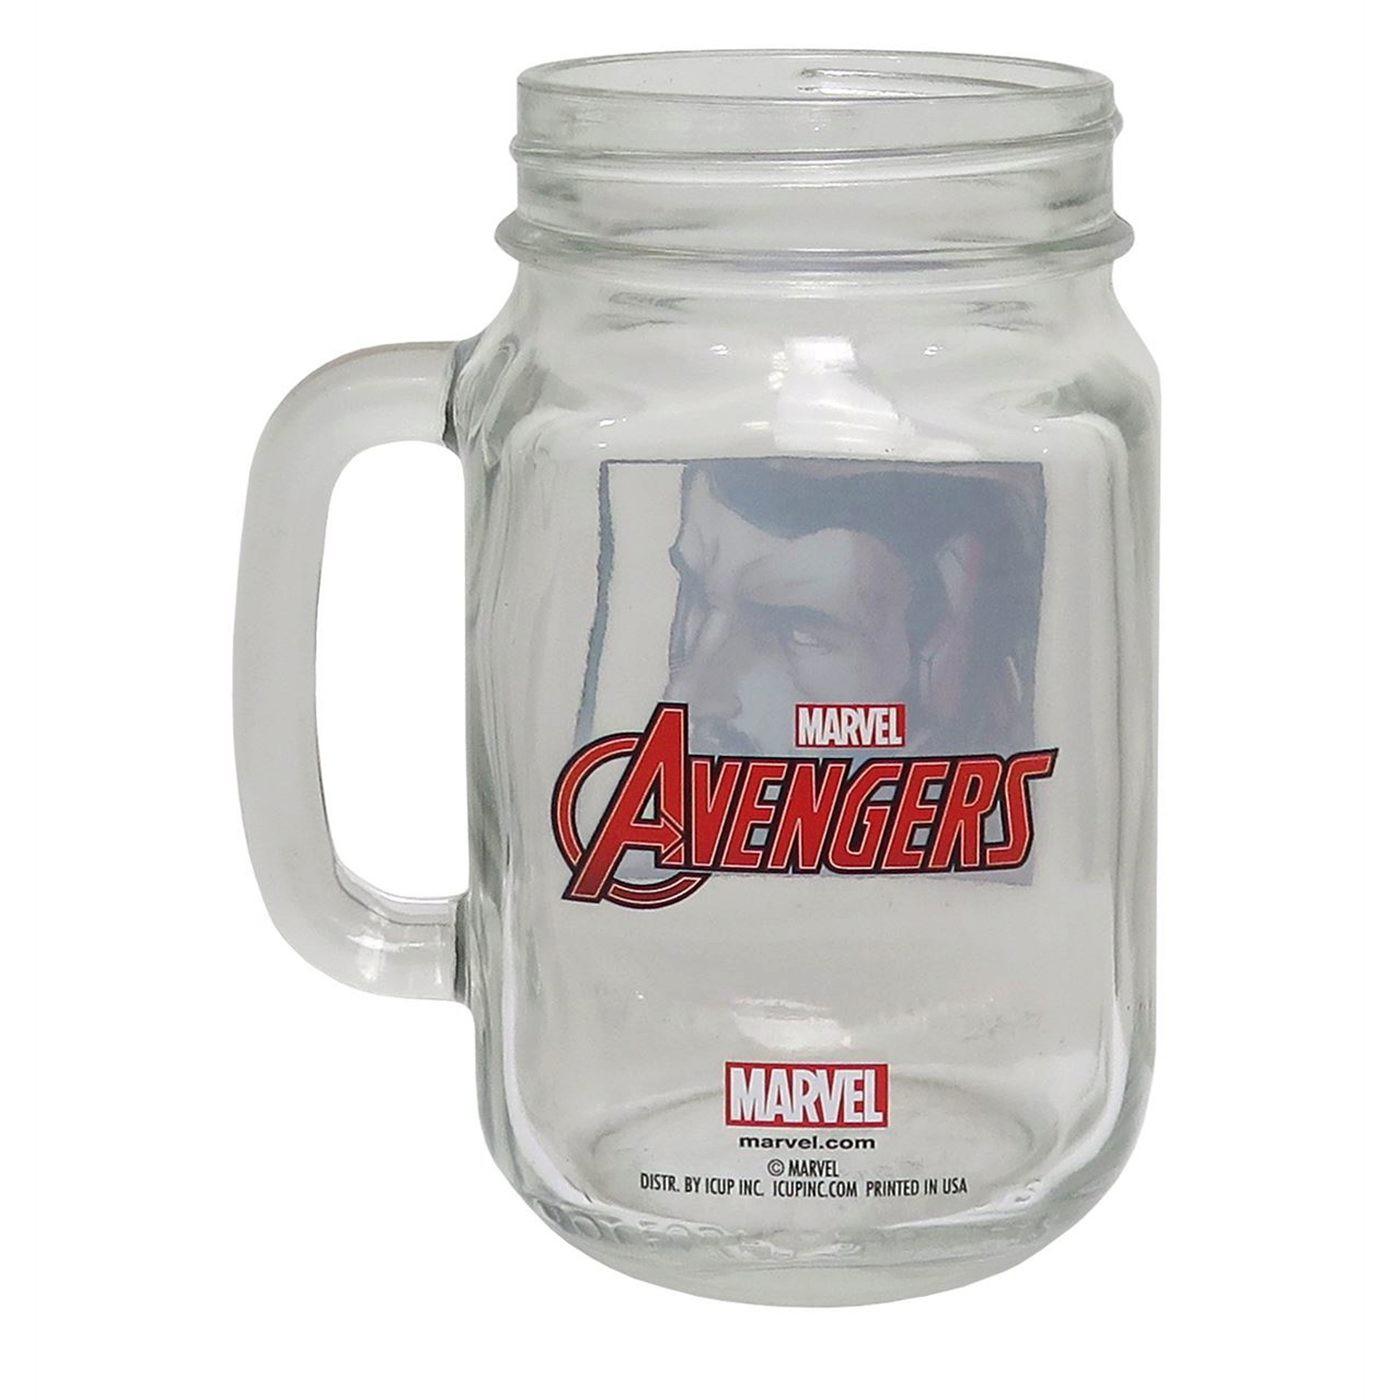 Iron Man Close-Up Mason Jar Mug